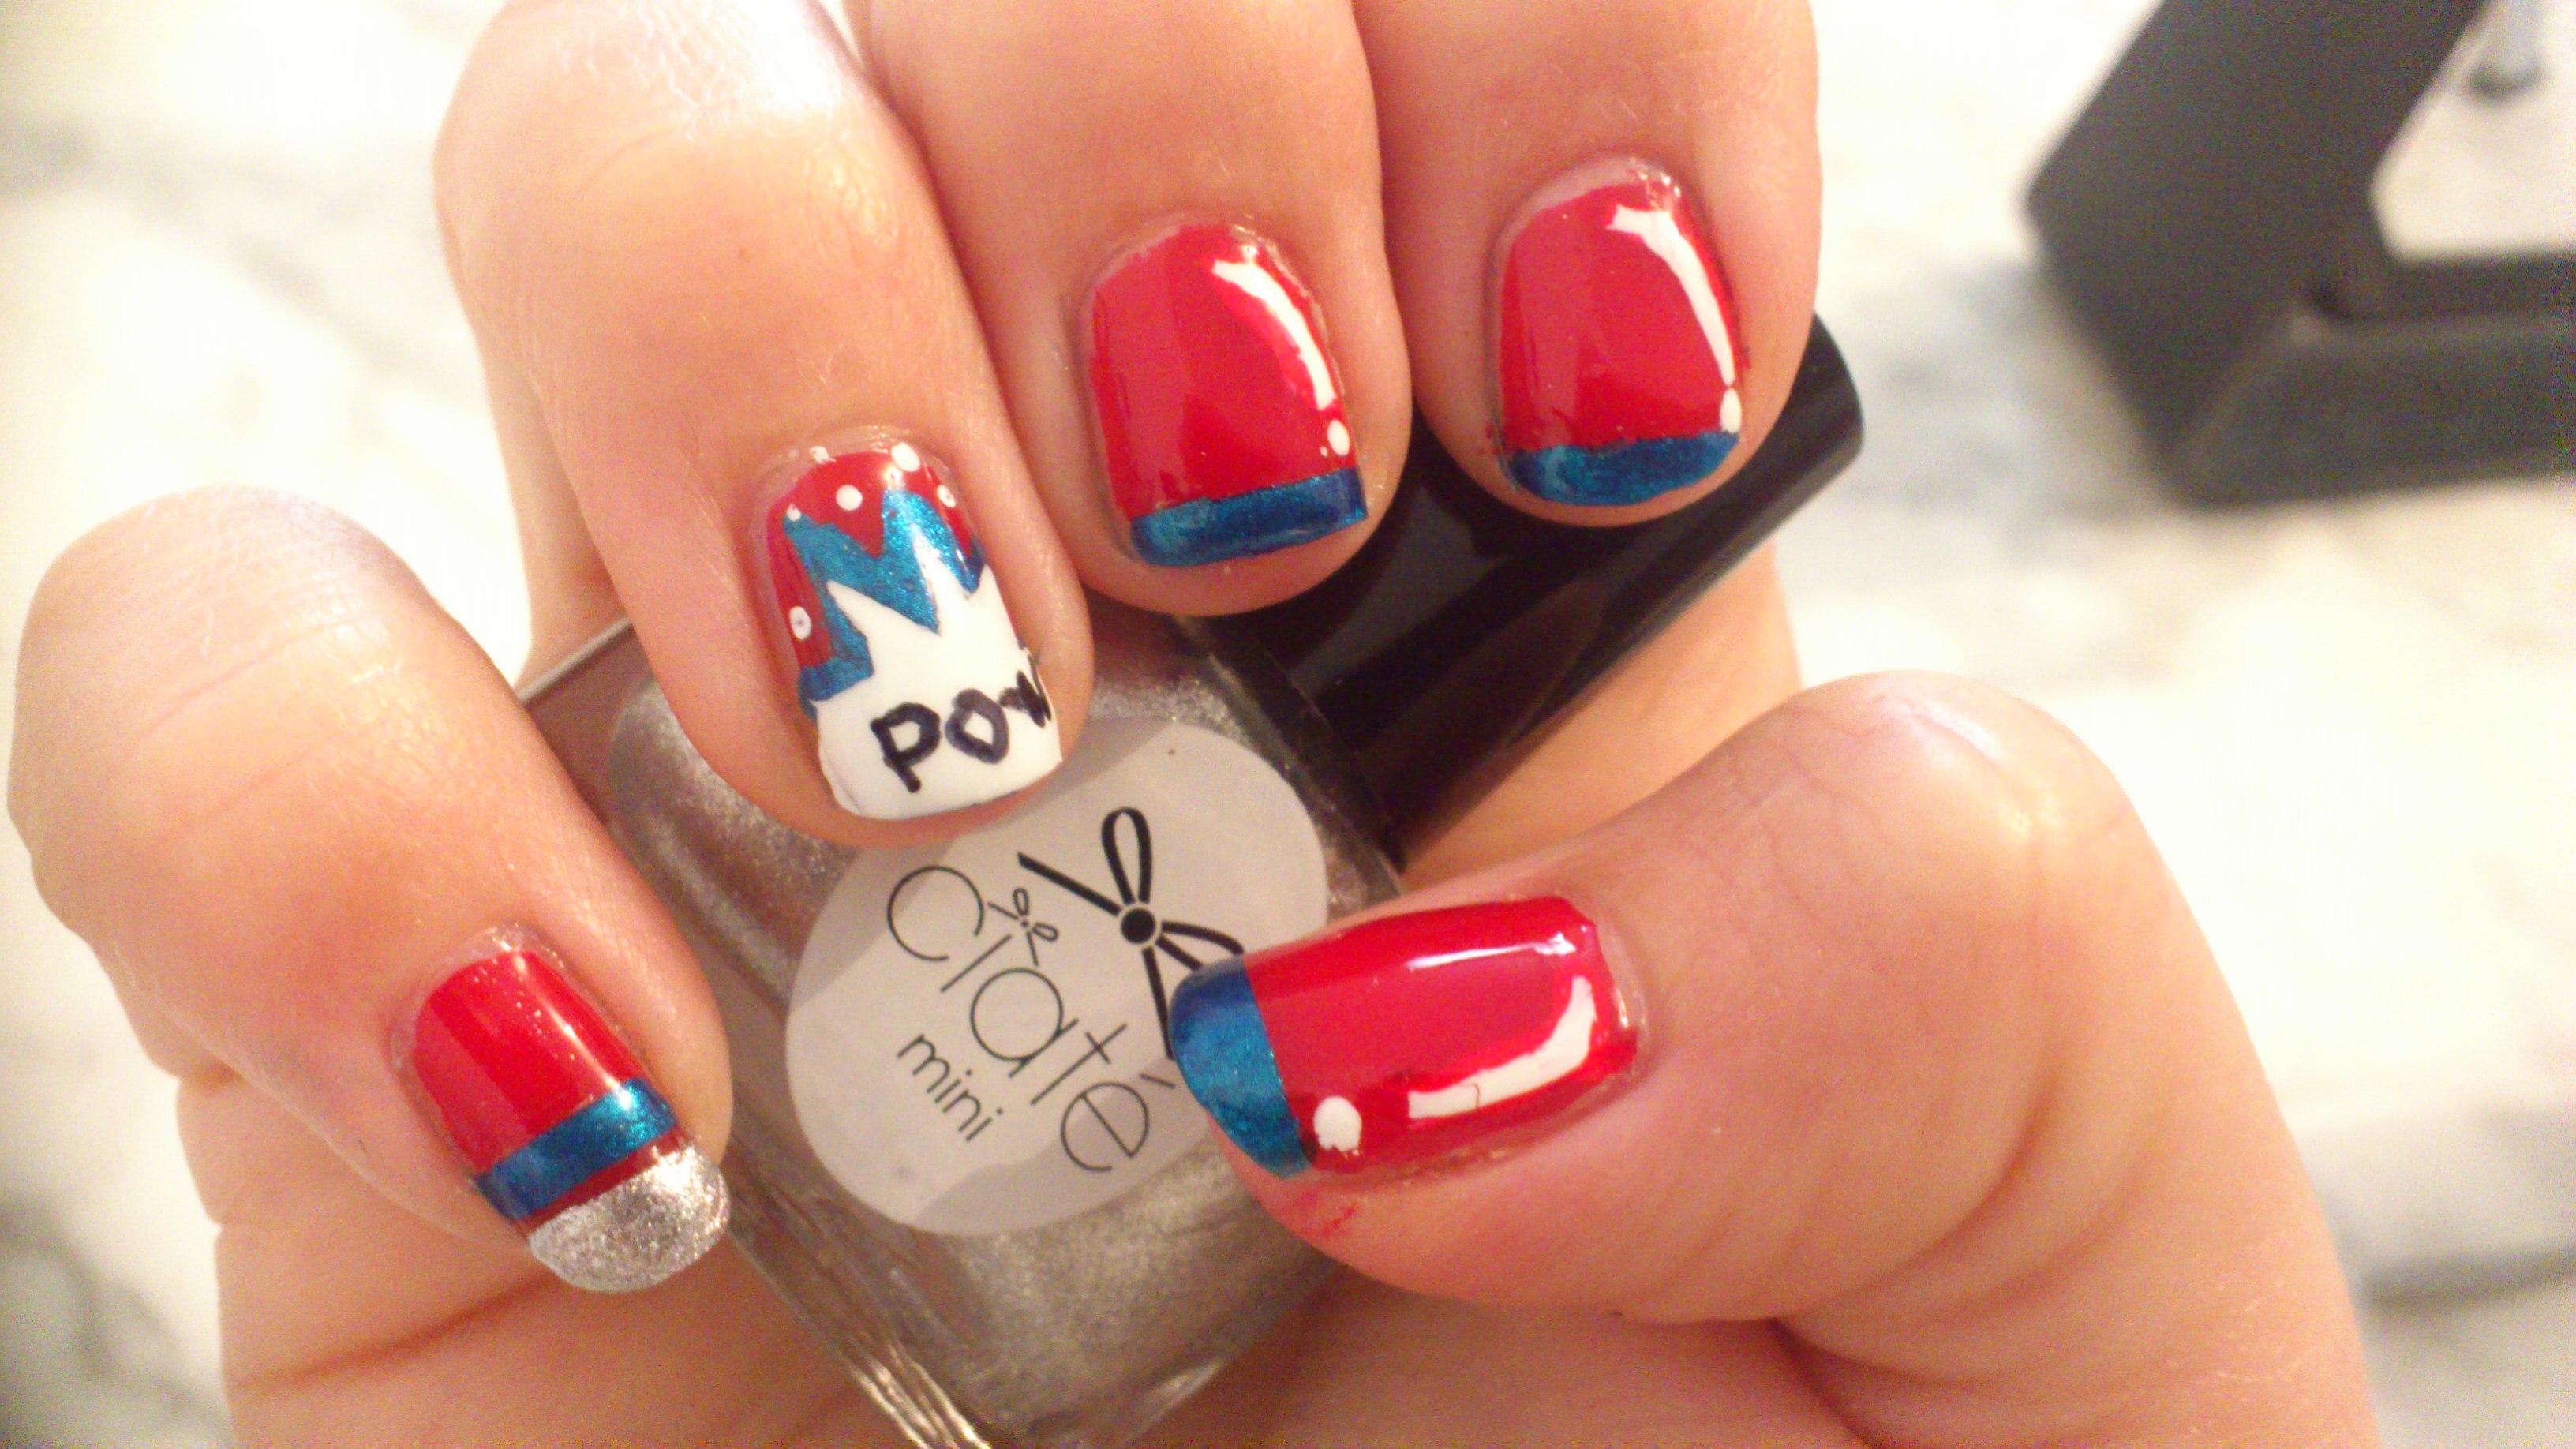 Exceptionnel Nailstorming #39 Bande Dessinée – Mes ongle en mode Wonder Woman  VD67